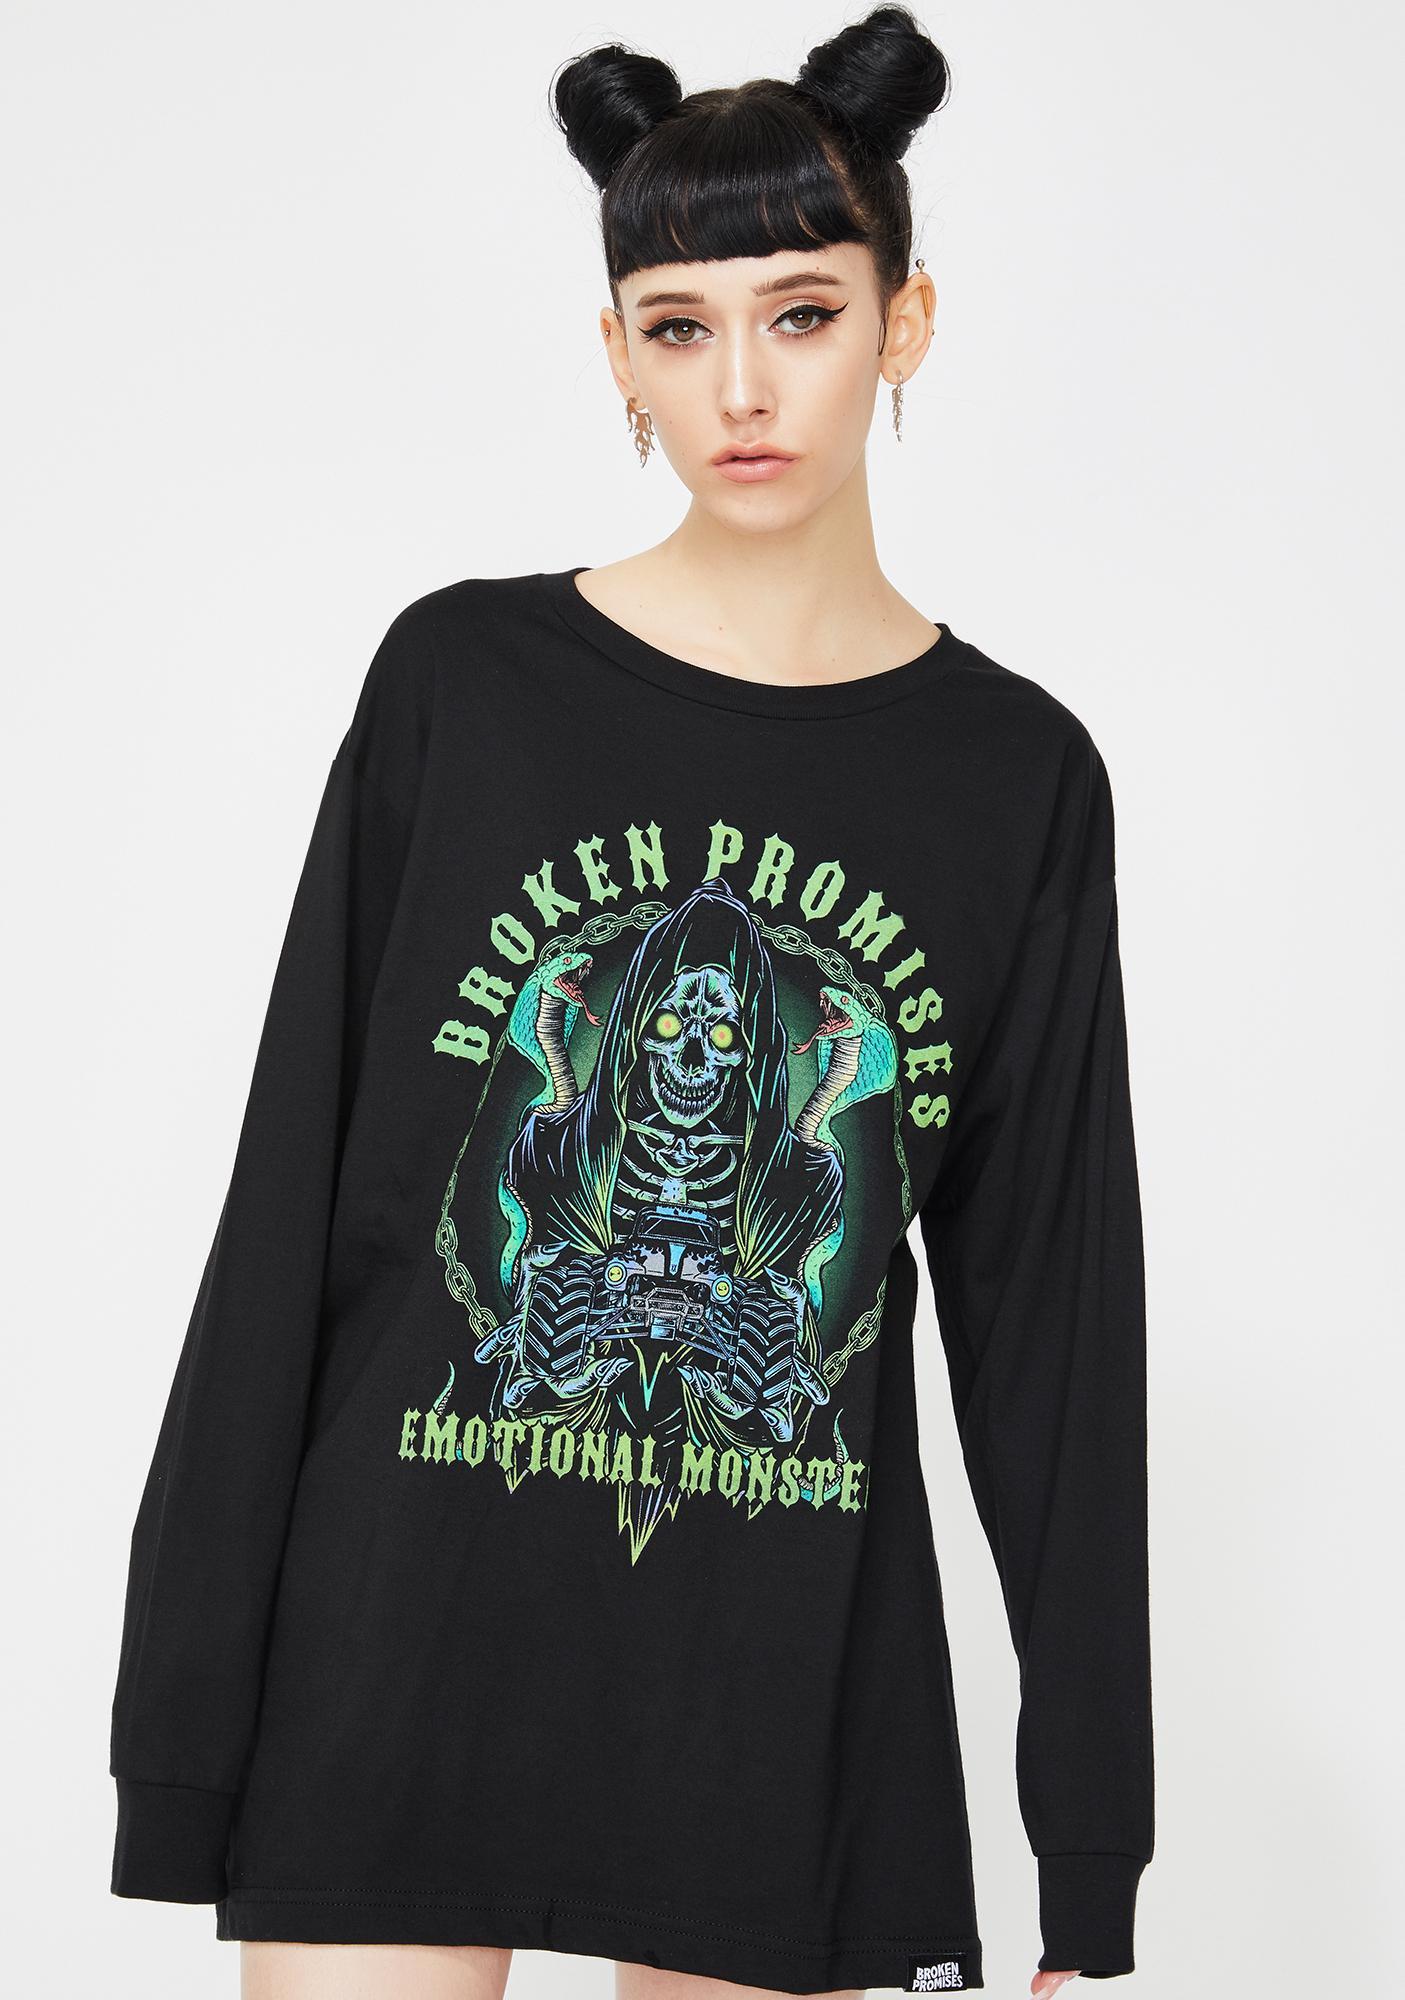 BROKEN PROMISES CO Grim Graveyard Long Sleeve Graphic Tee